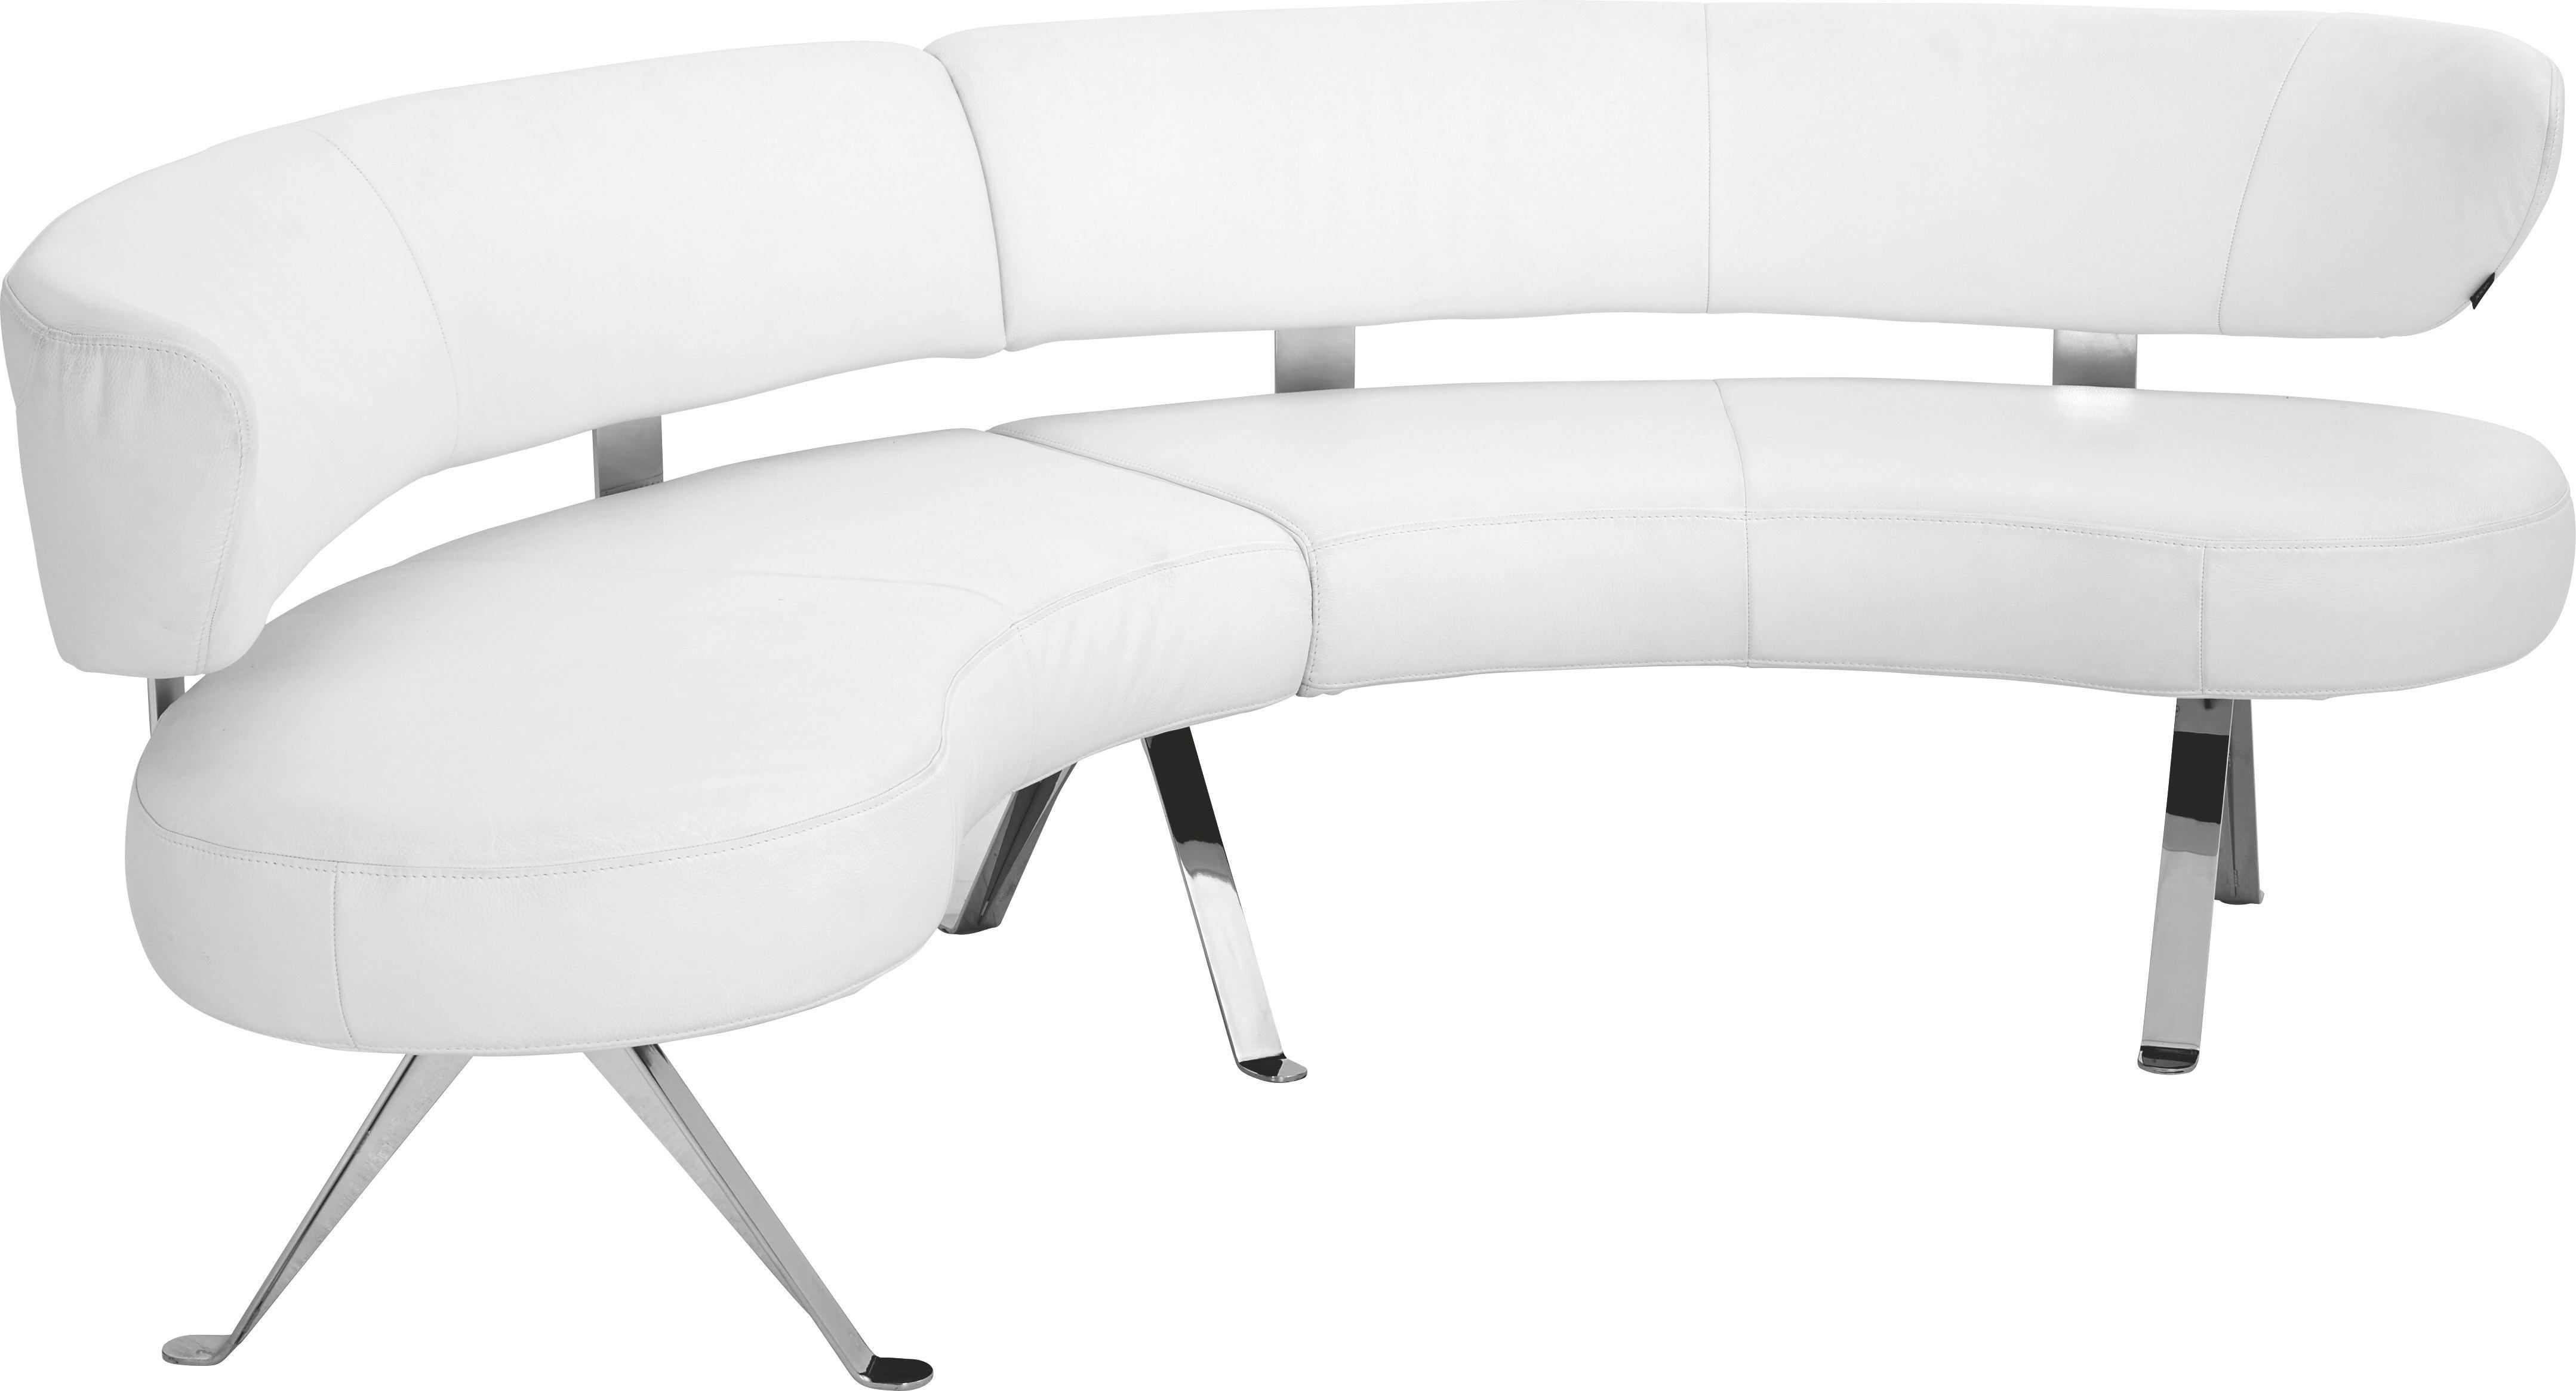 Elegant RUNDBANK Echtleder Weiß   Alufarben/Weiß, Design, Leder/Metall (234cm)